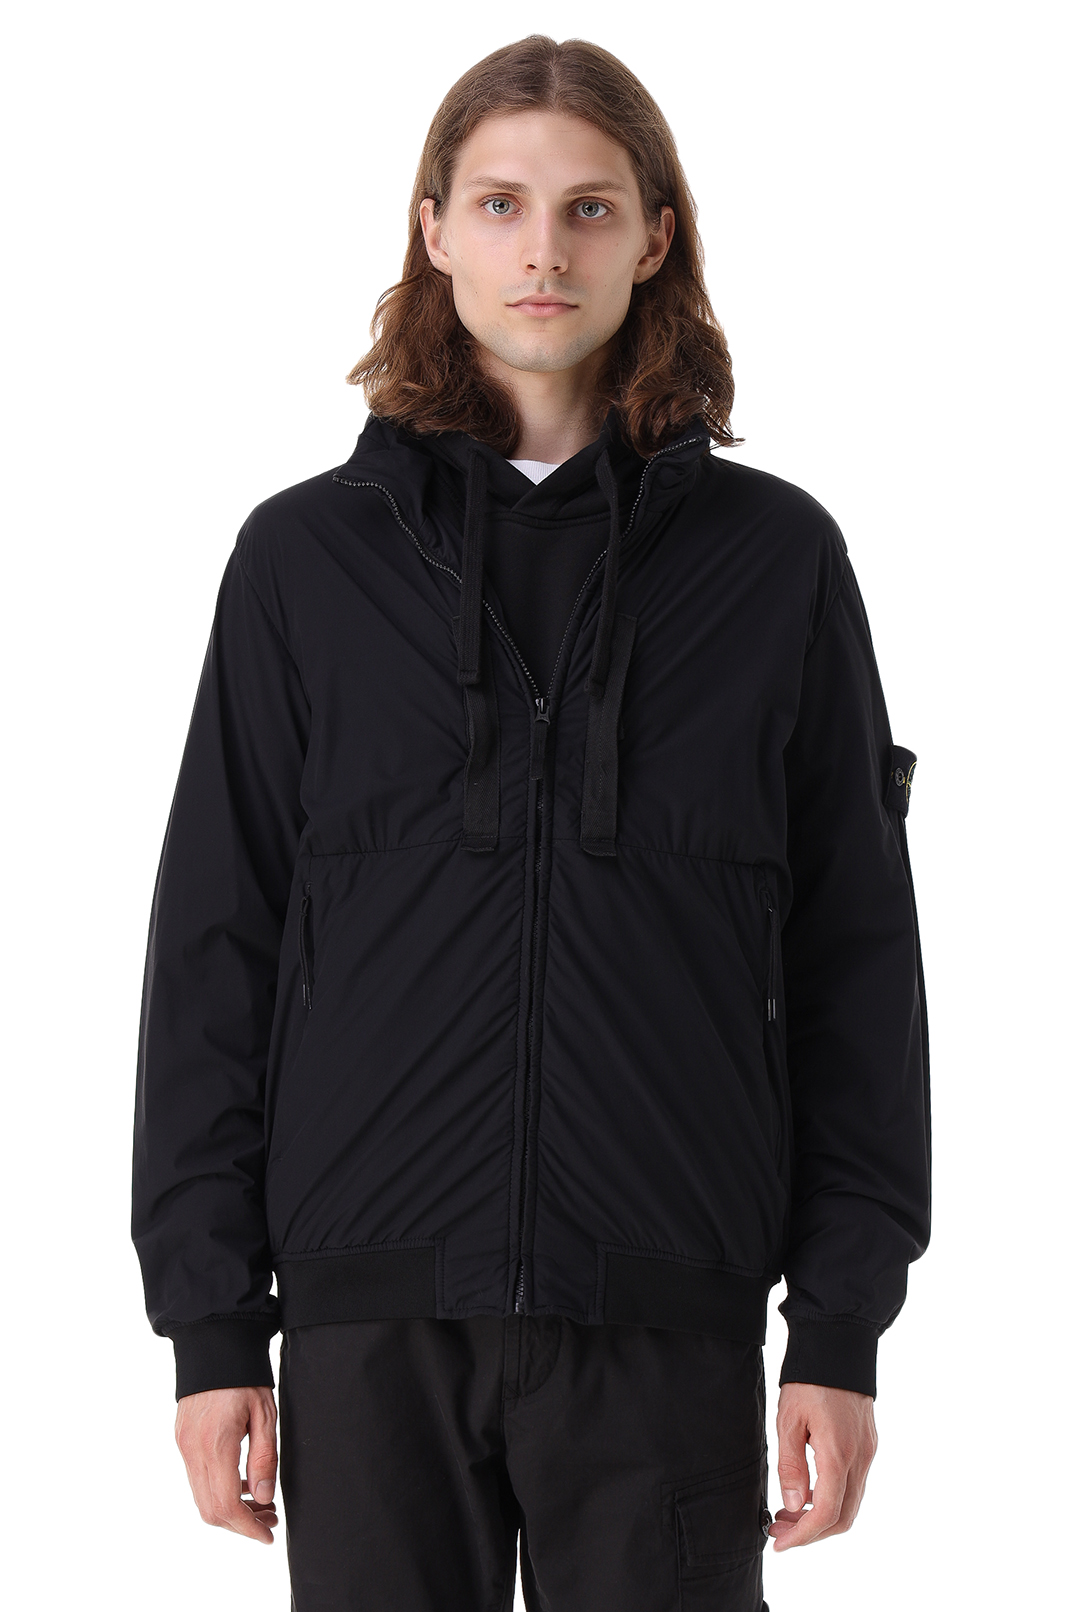 Куртка с потайным капюшоном STONE ISLAND STm21046